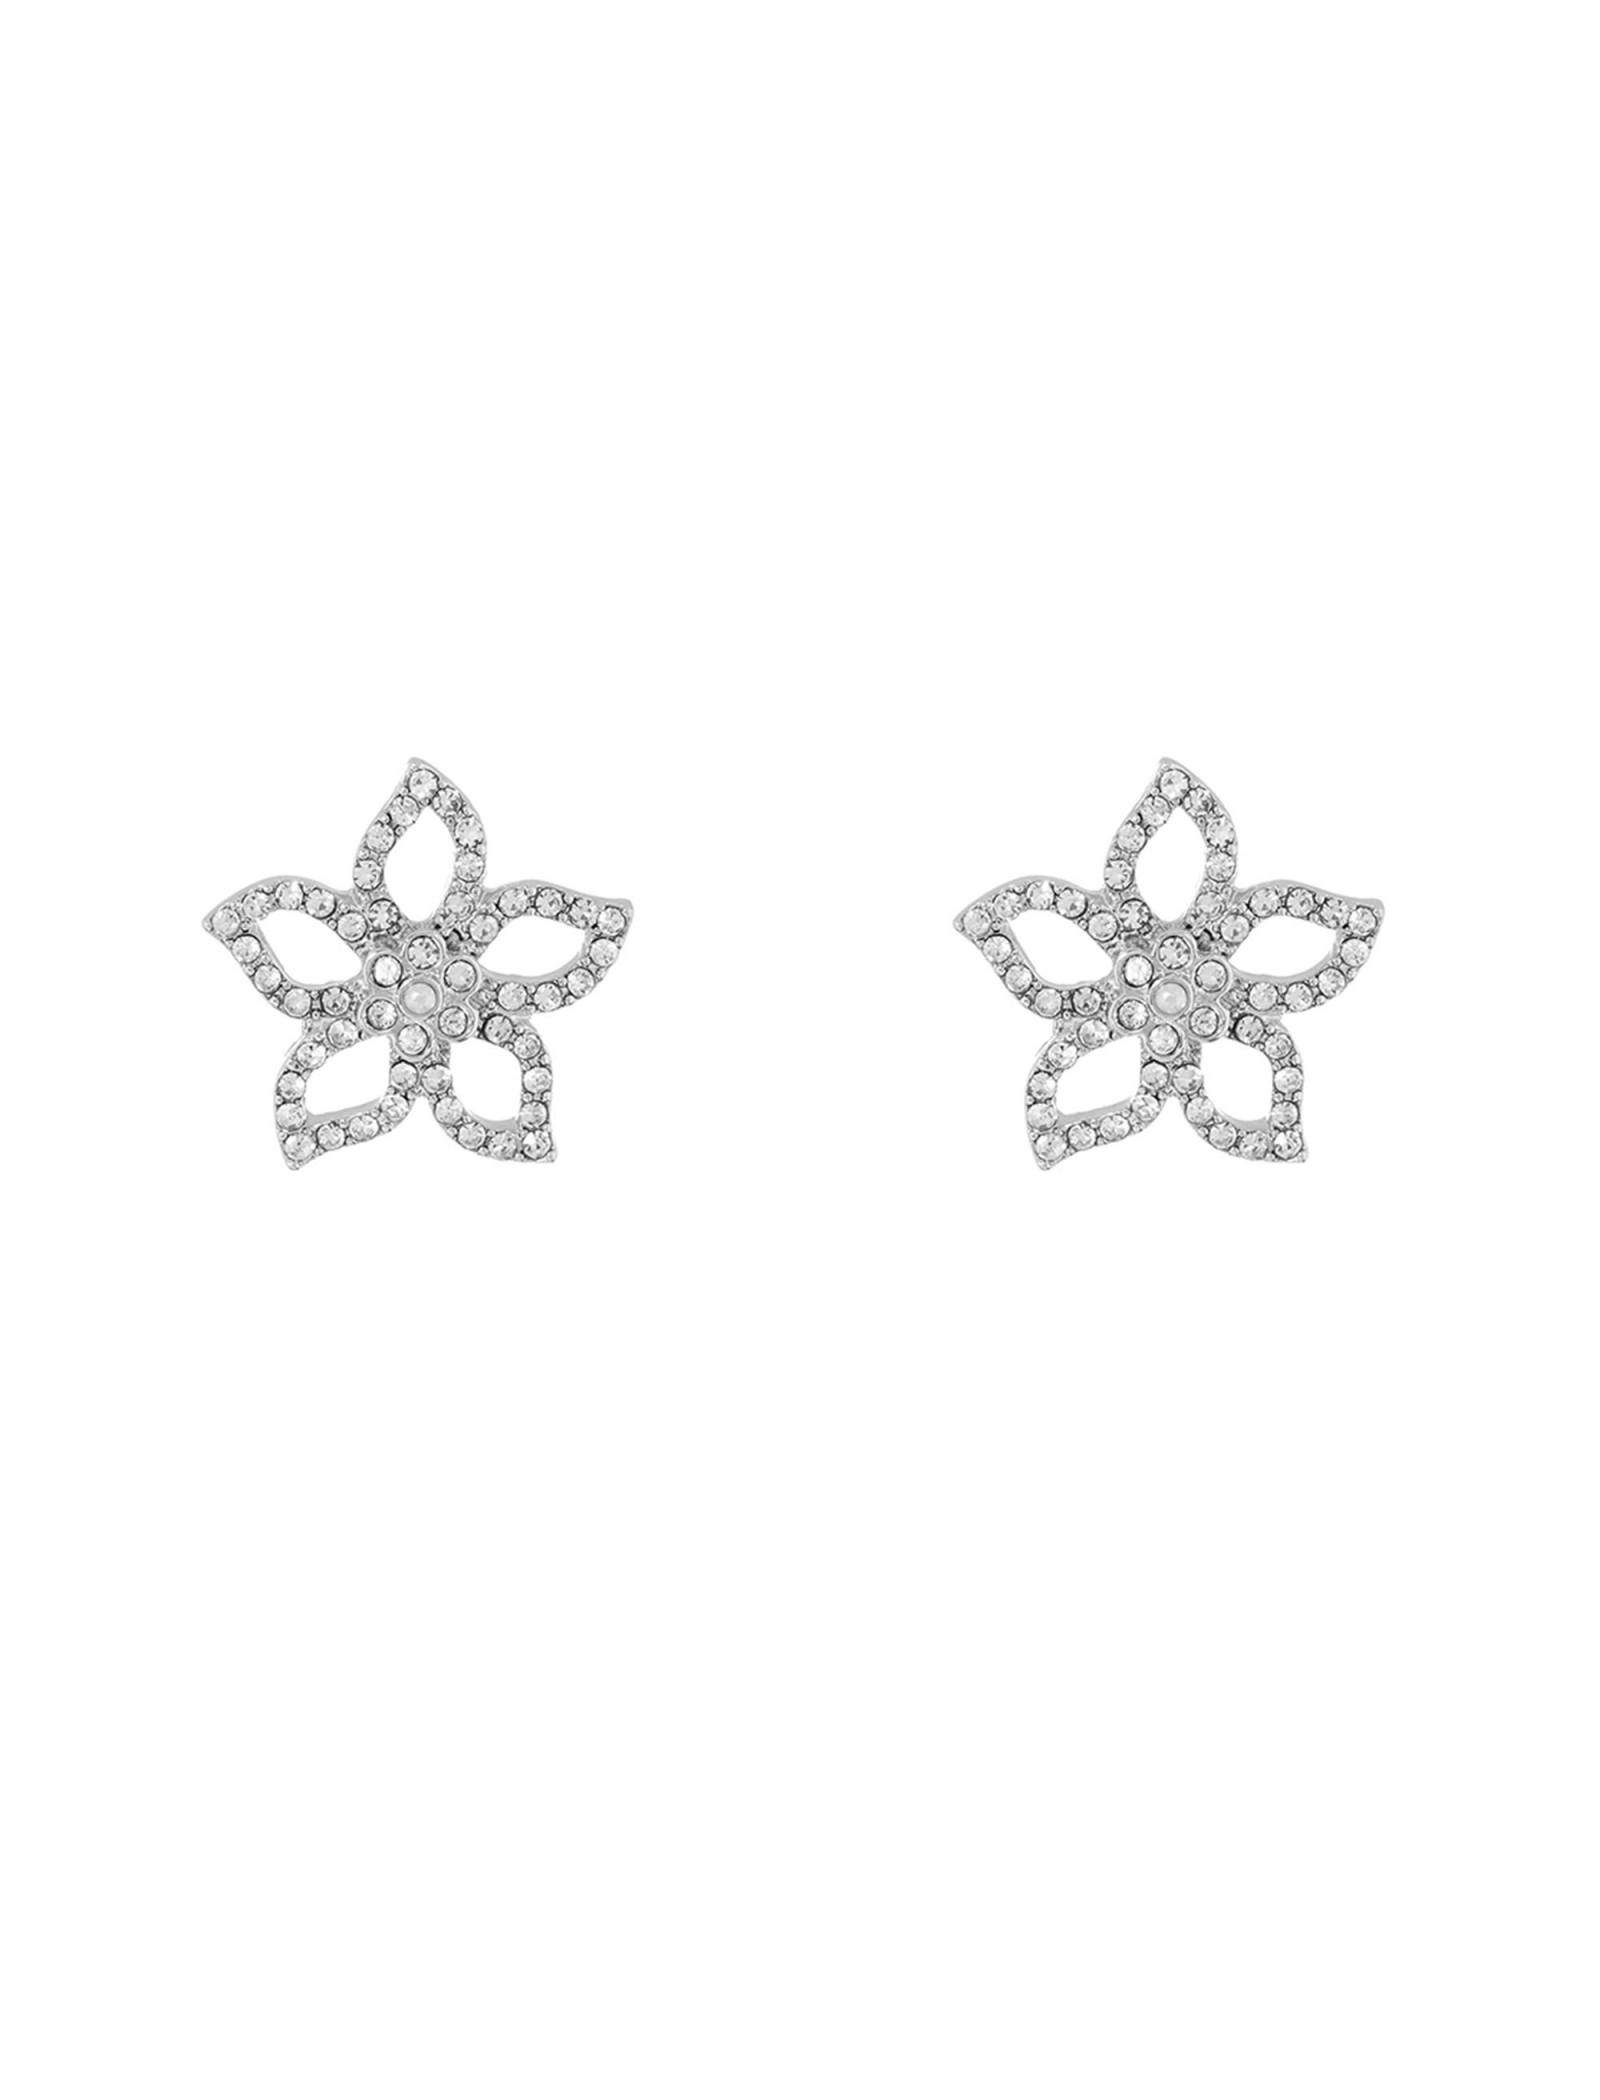 گوشواره میخی زنانه Cut Out Flower Stud - اکسسورایز تک سایز -  - 3